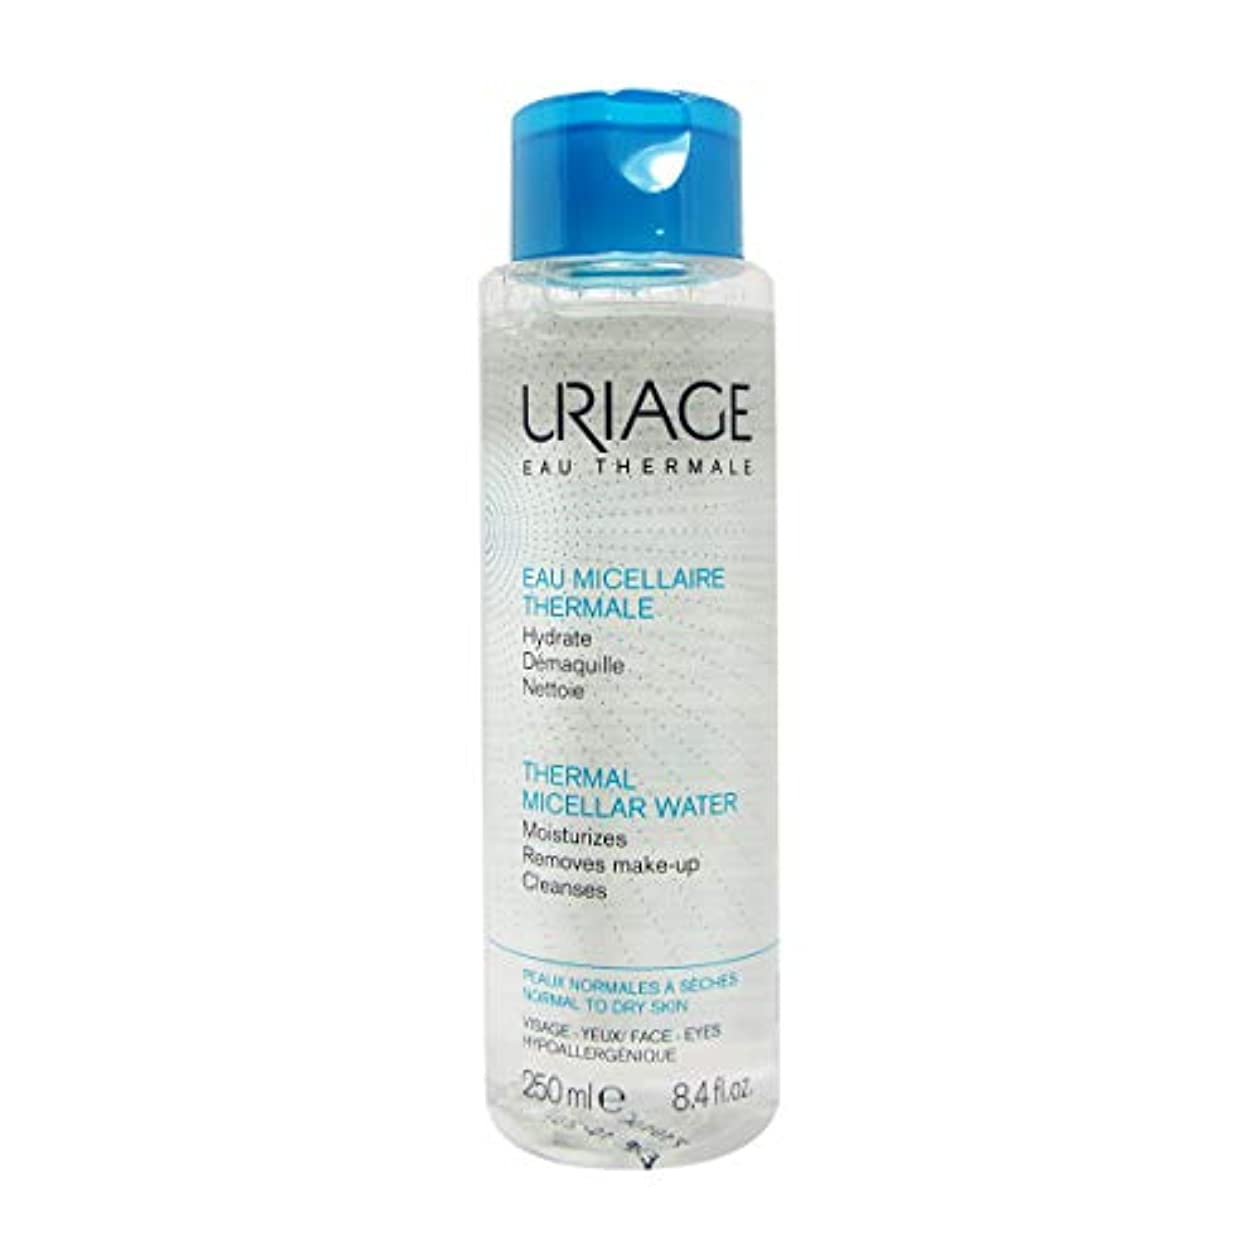 Uriage Thermal Micellar Water Normal To Dry Skin 250ml [並行輸入品]